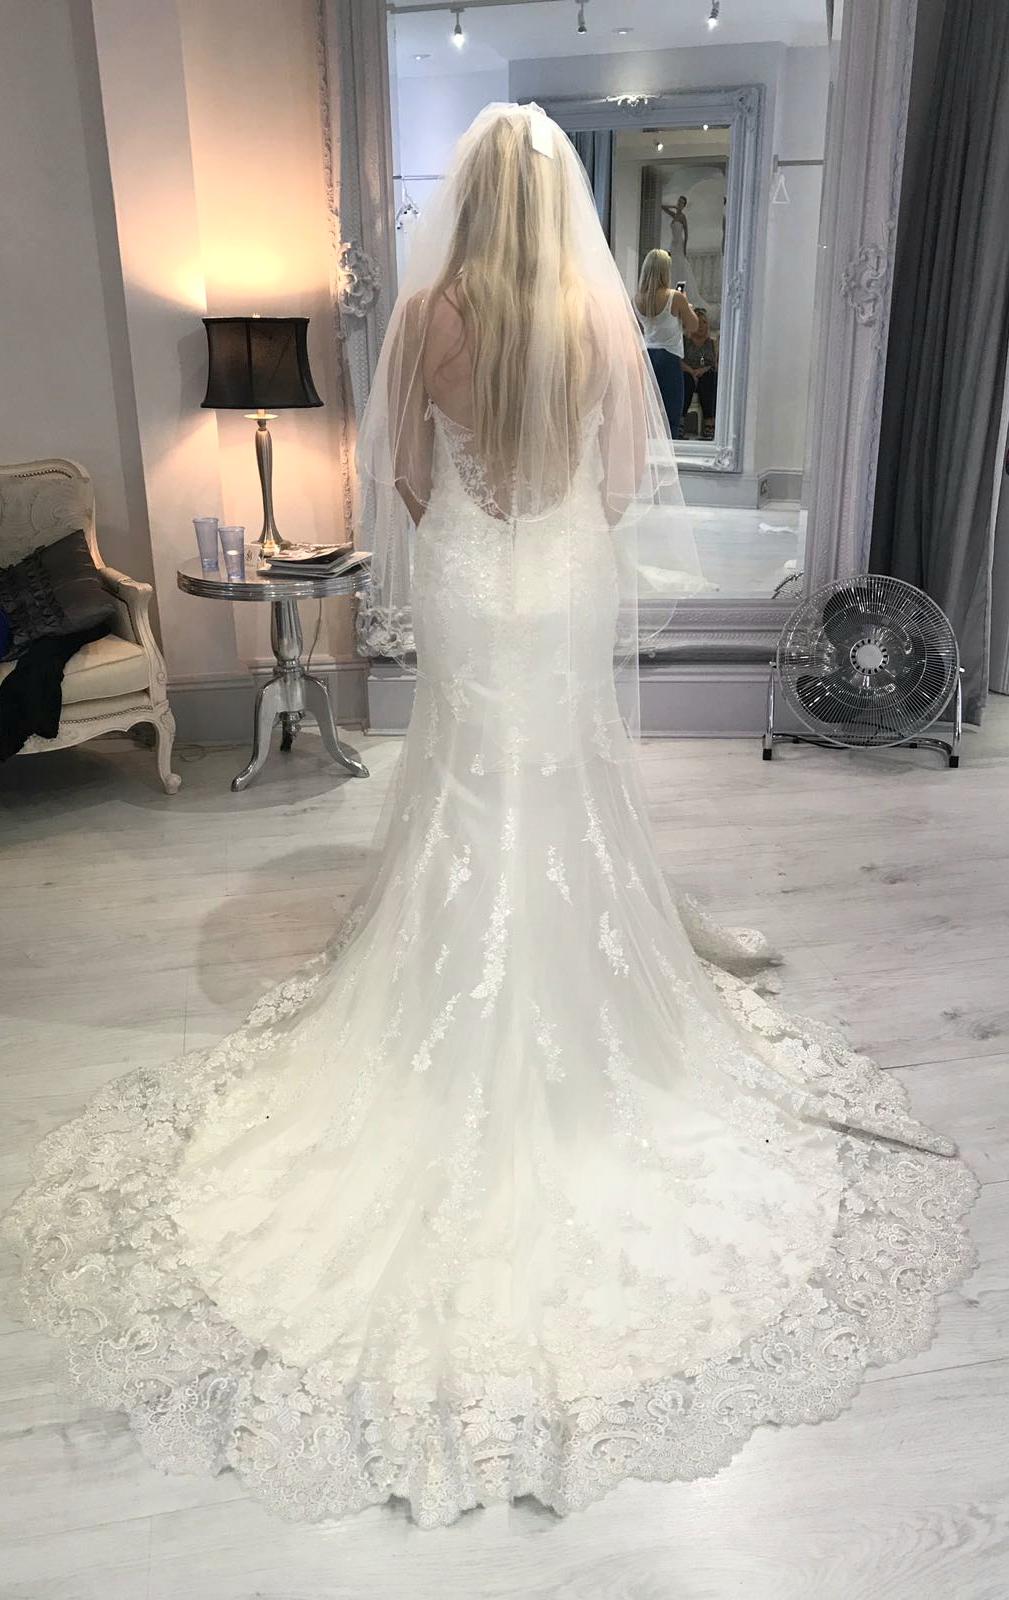 b0d679d31619 Wedding Dress Shopping at Windsor and Eton Brides   Blonde Vision